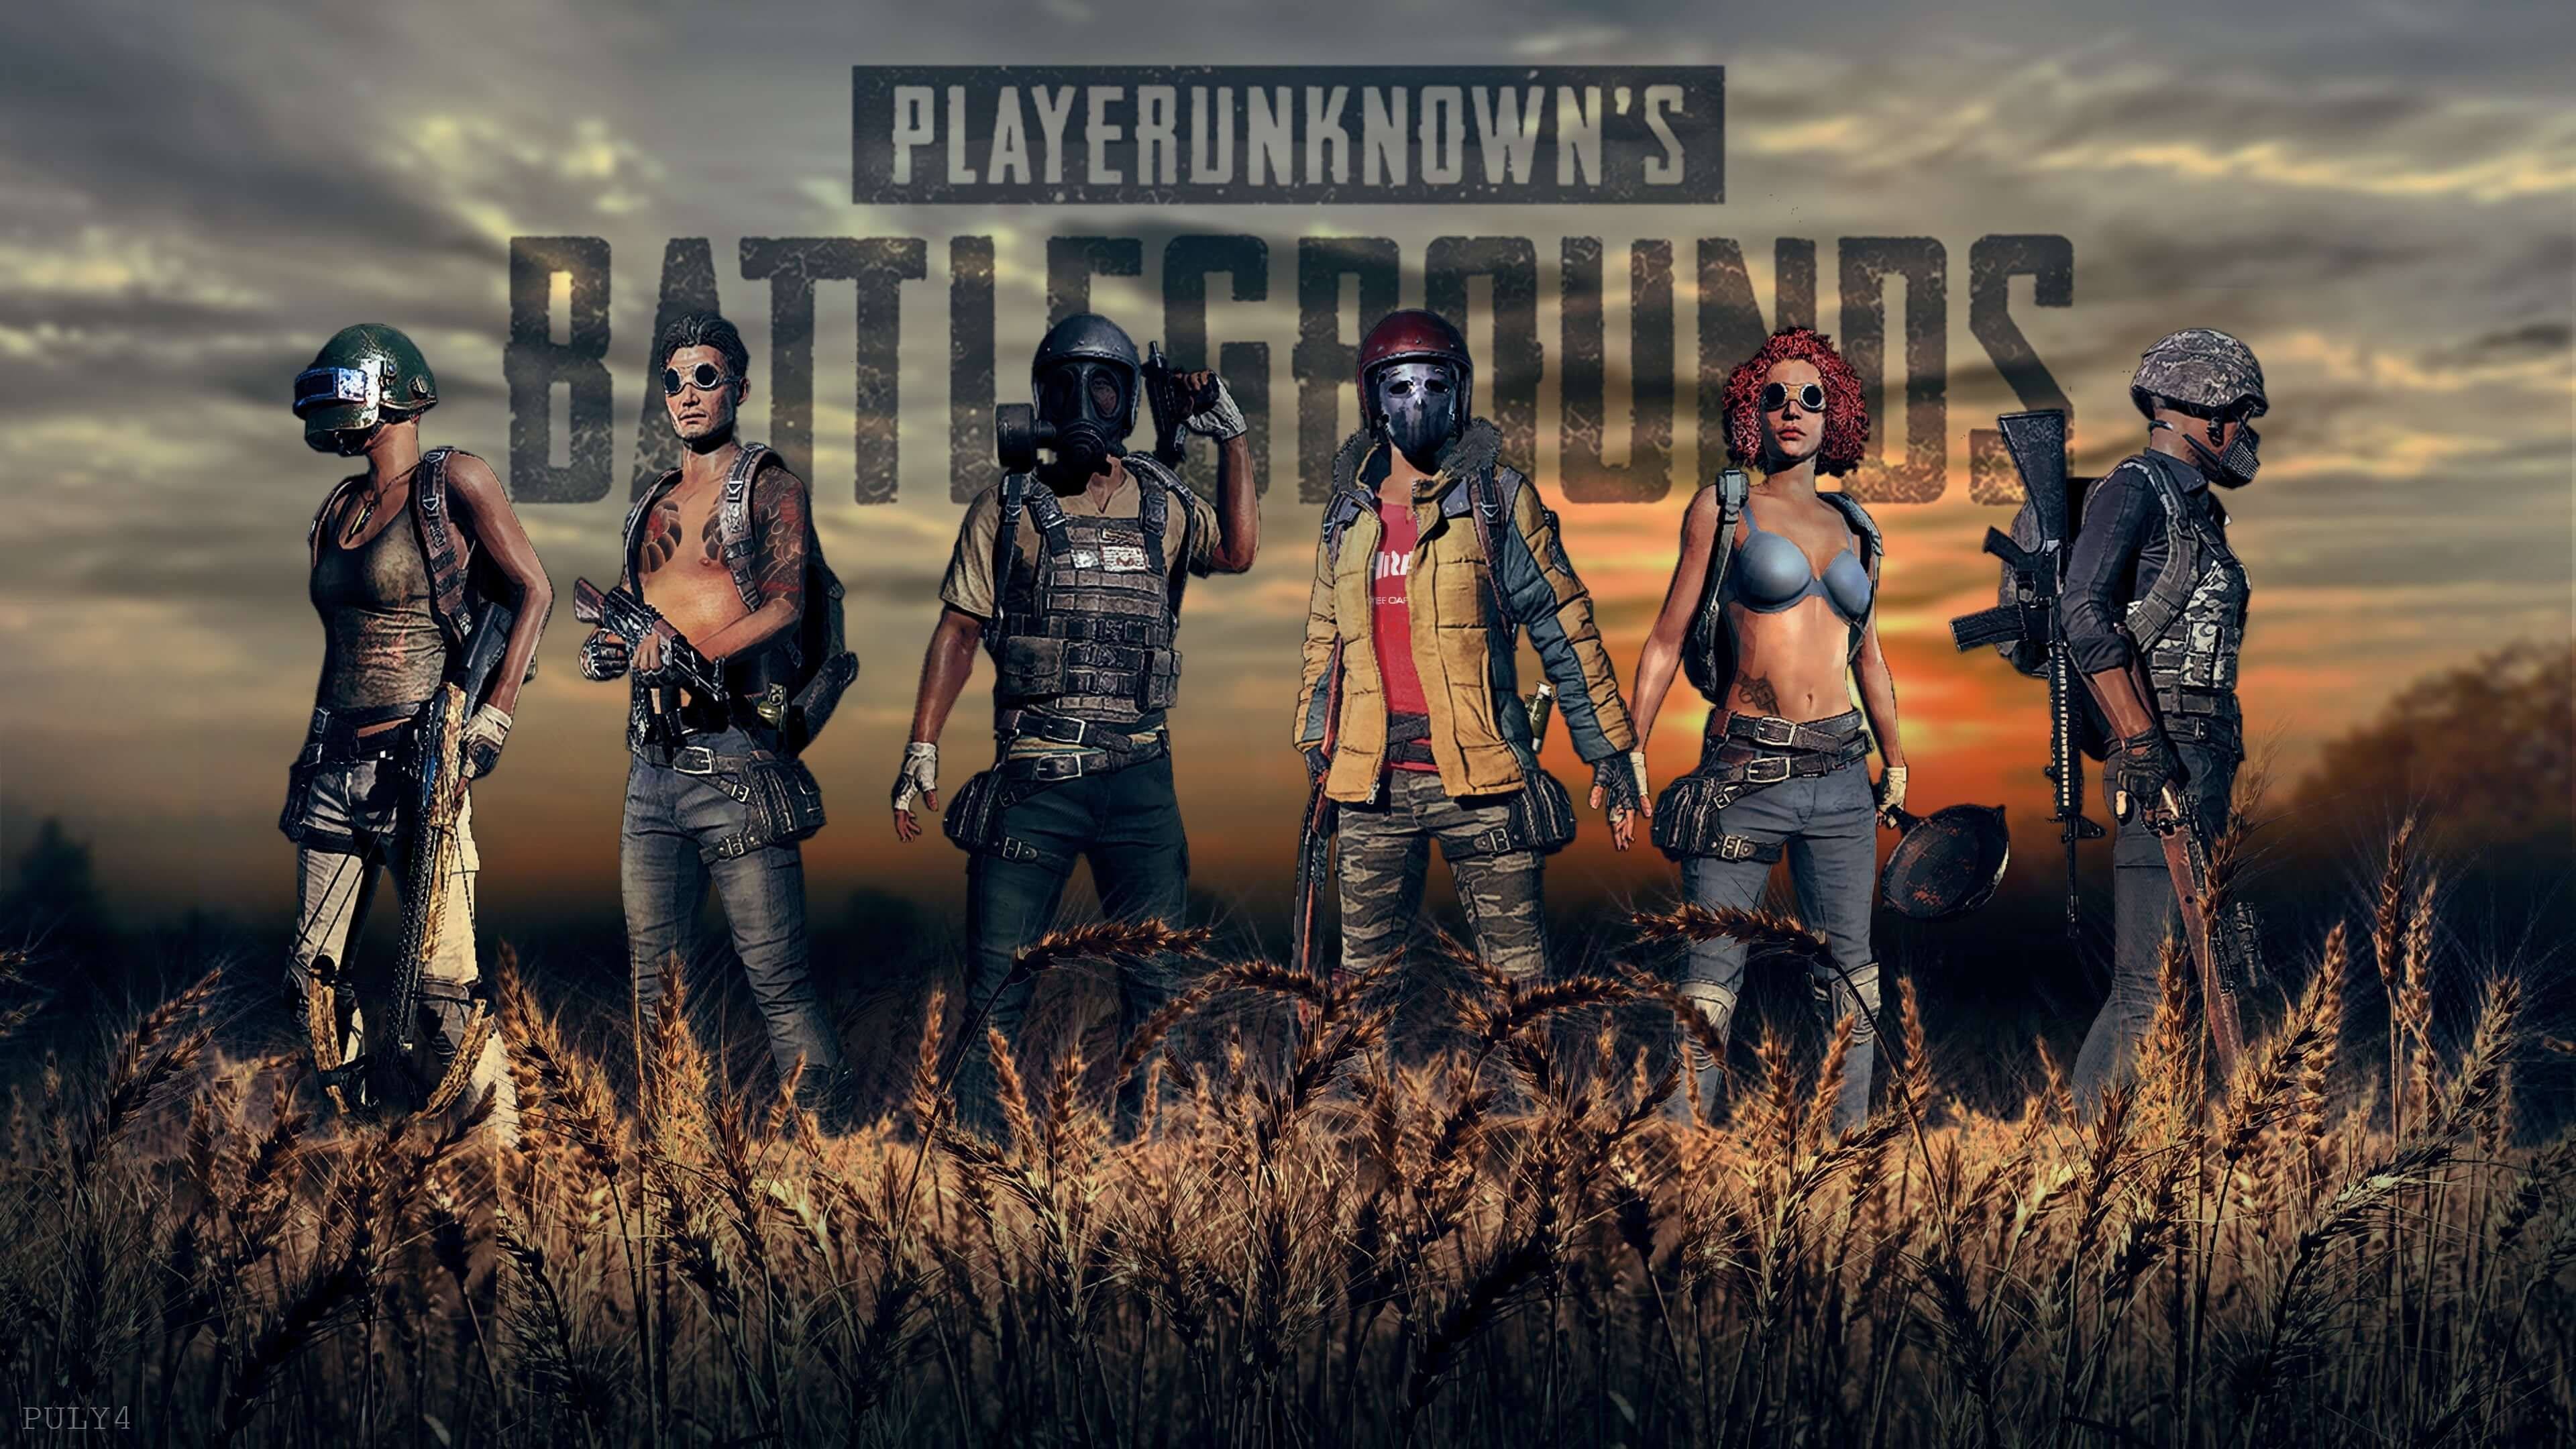 Обои PlayerUnknown's Battlegrounds 6 игроков